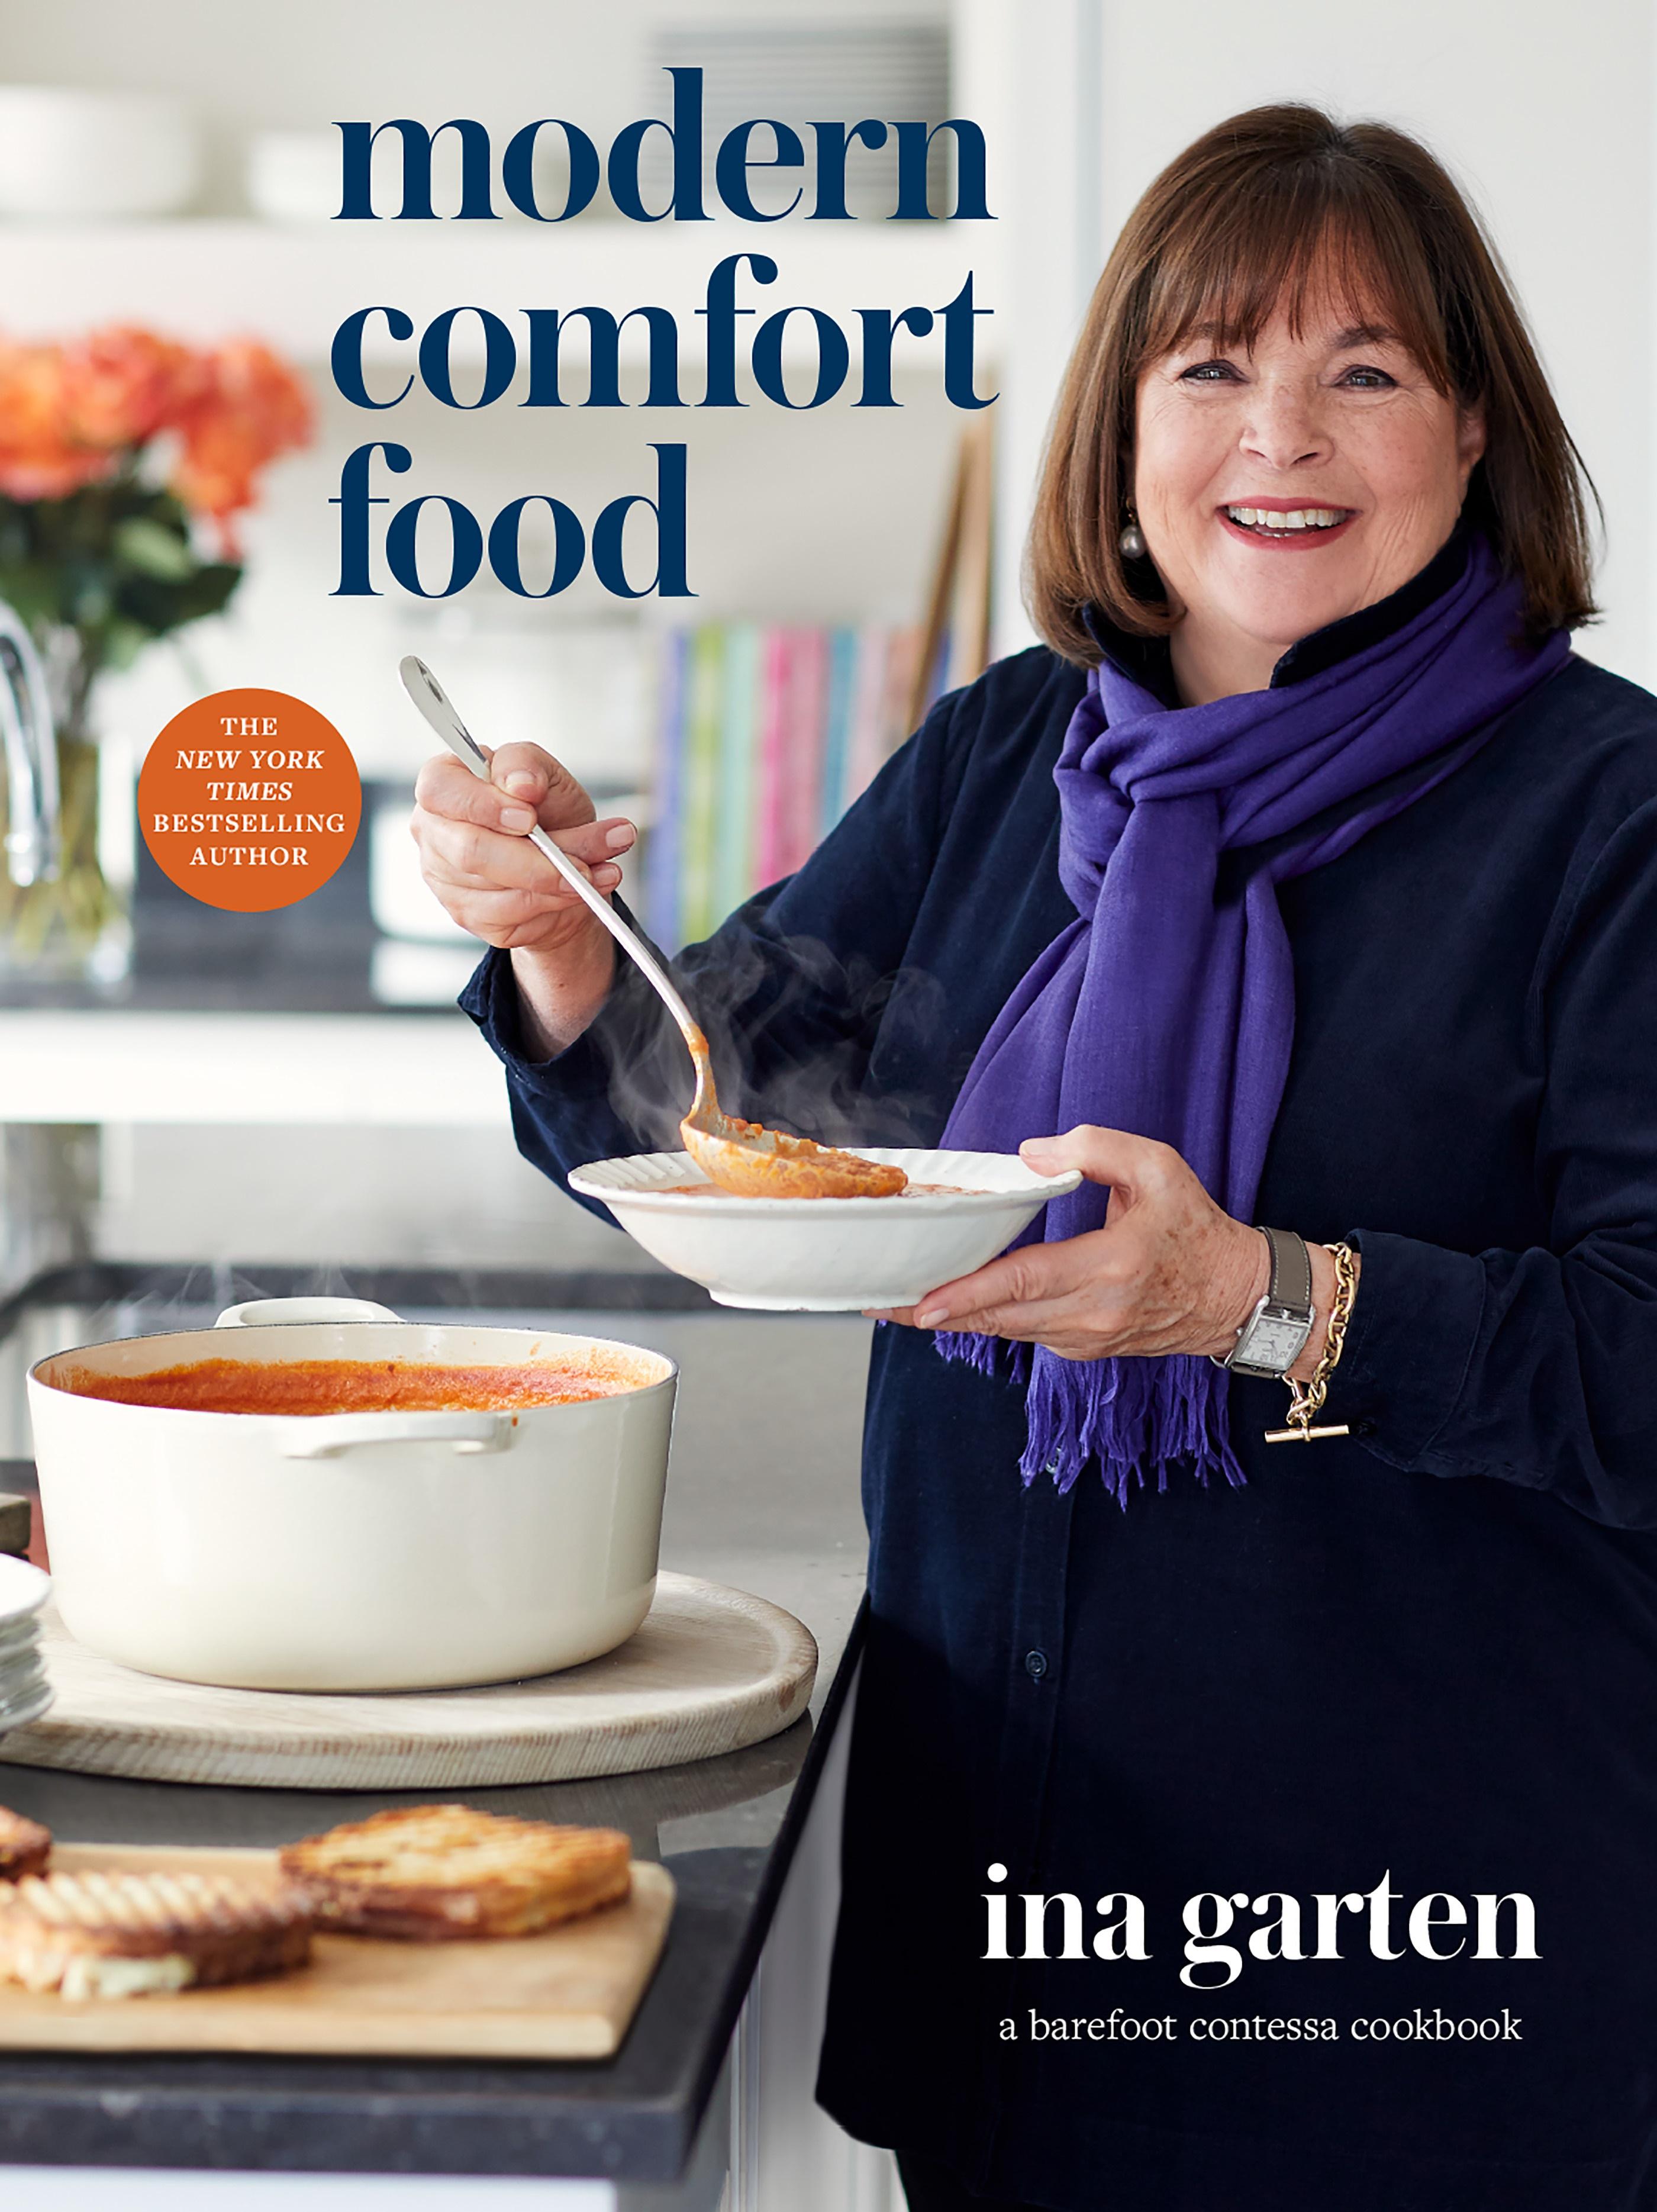 Ina Garten: Modern Comfort Food